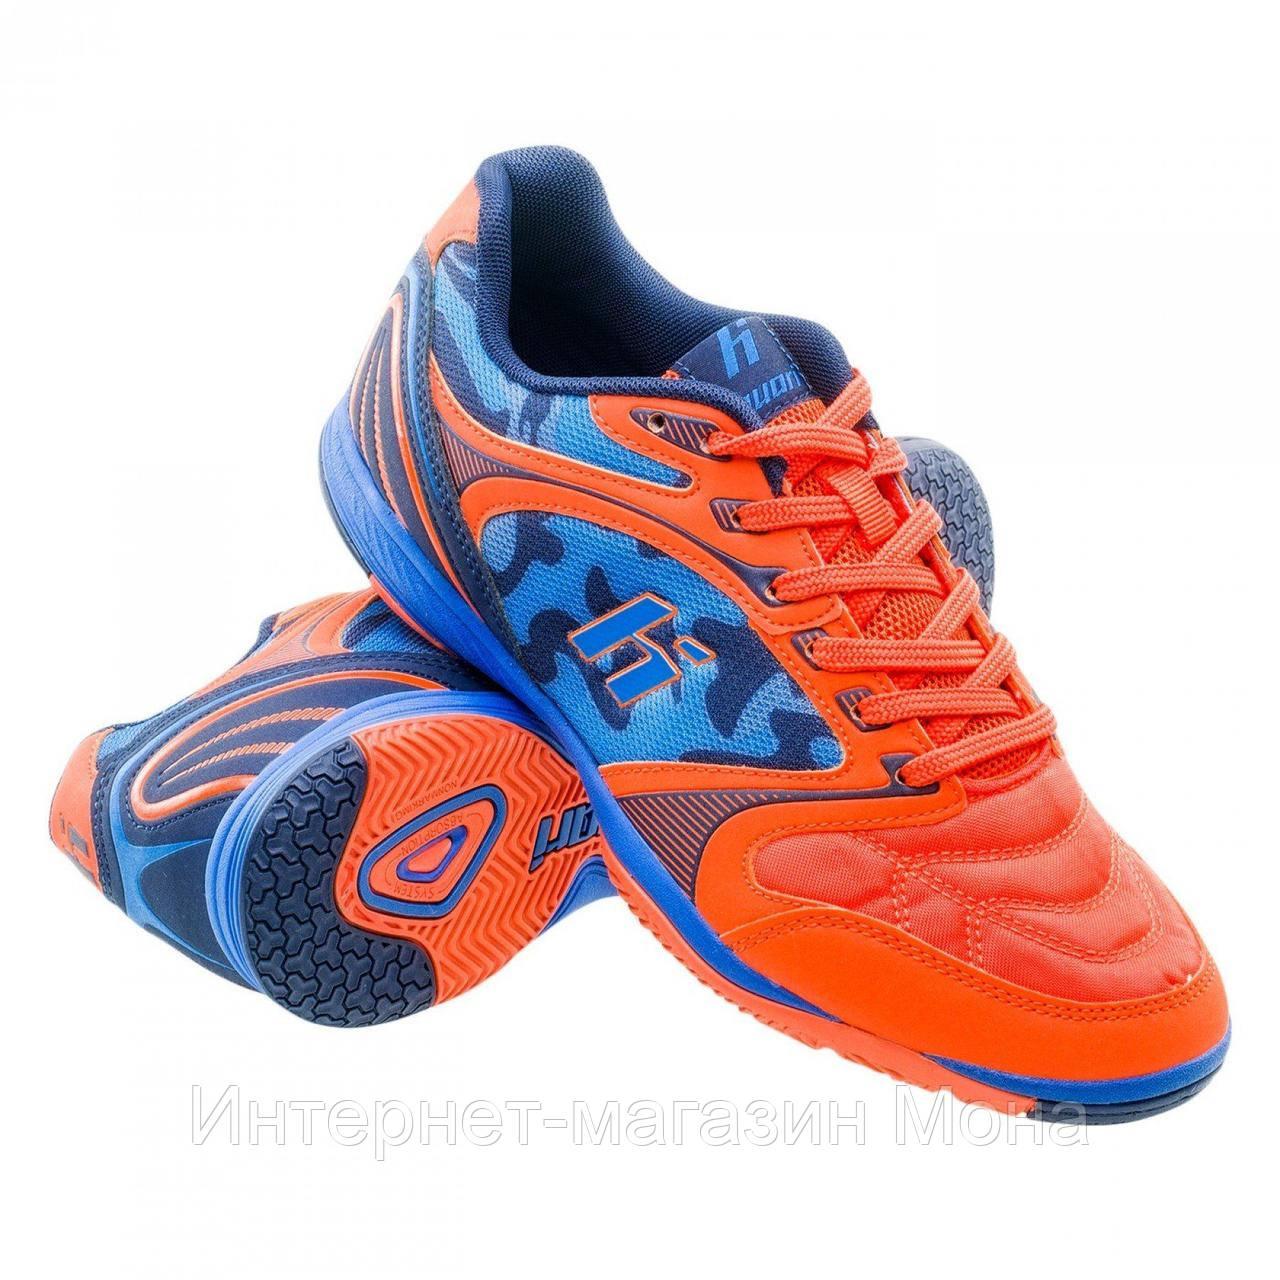 63f4e854 Huari футбольные бутсы EDINSON IC orange/navy/lake blue р. 41 - Интернет